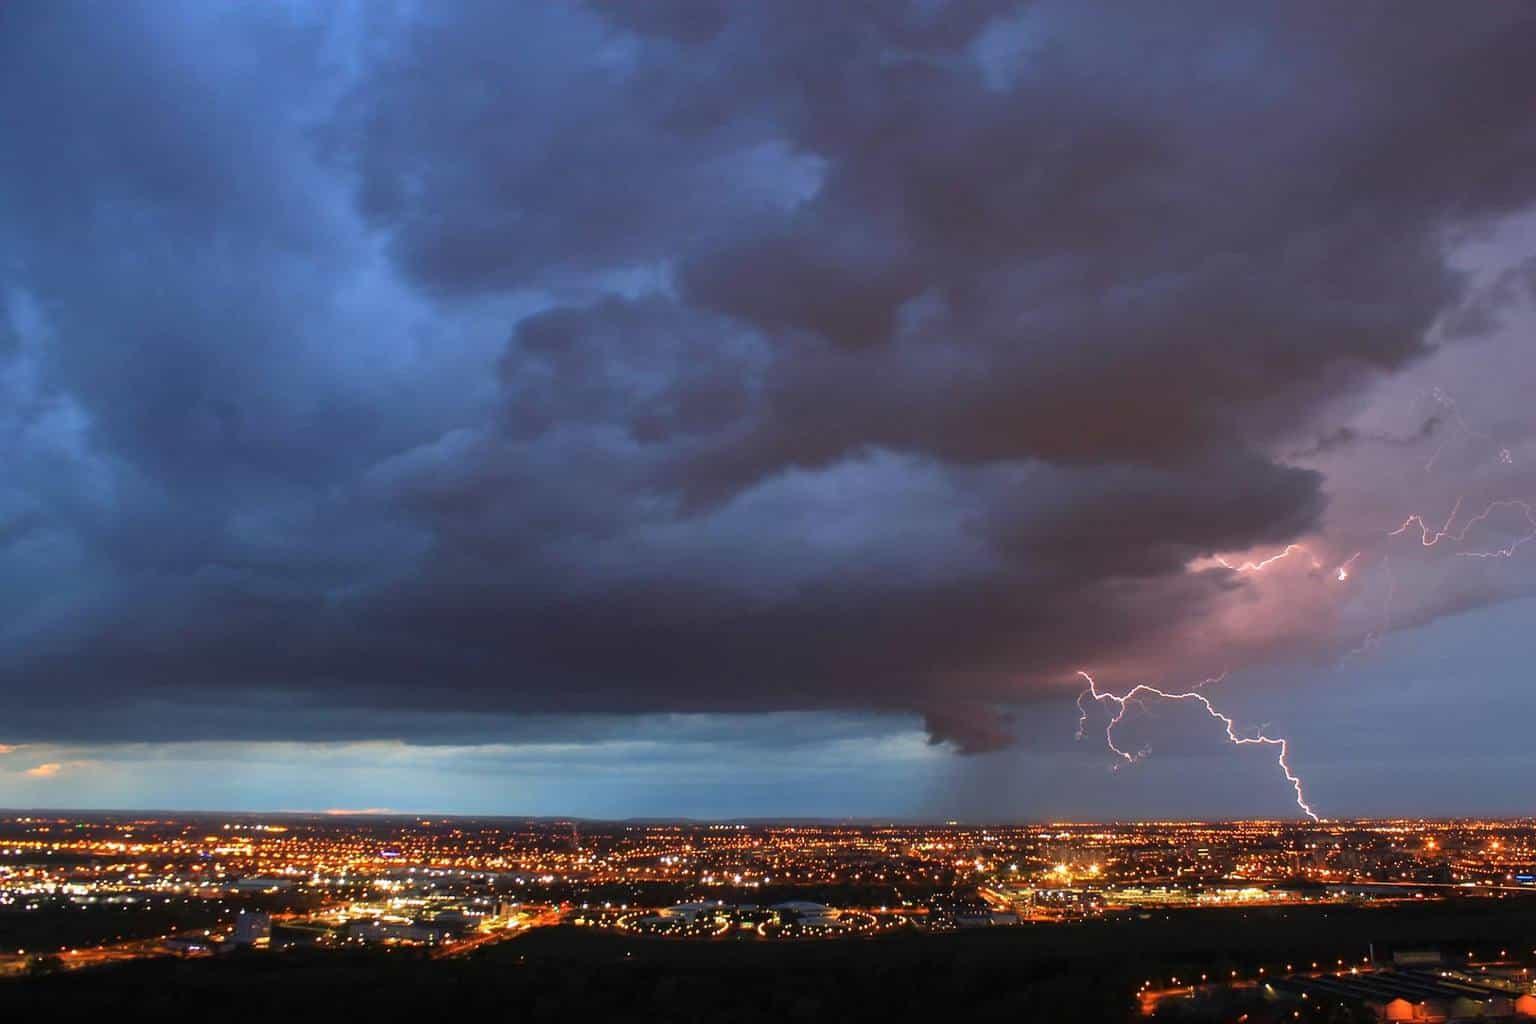 Lightning strike over Toulouse, France - 12th April 2016.